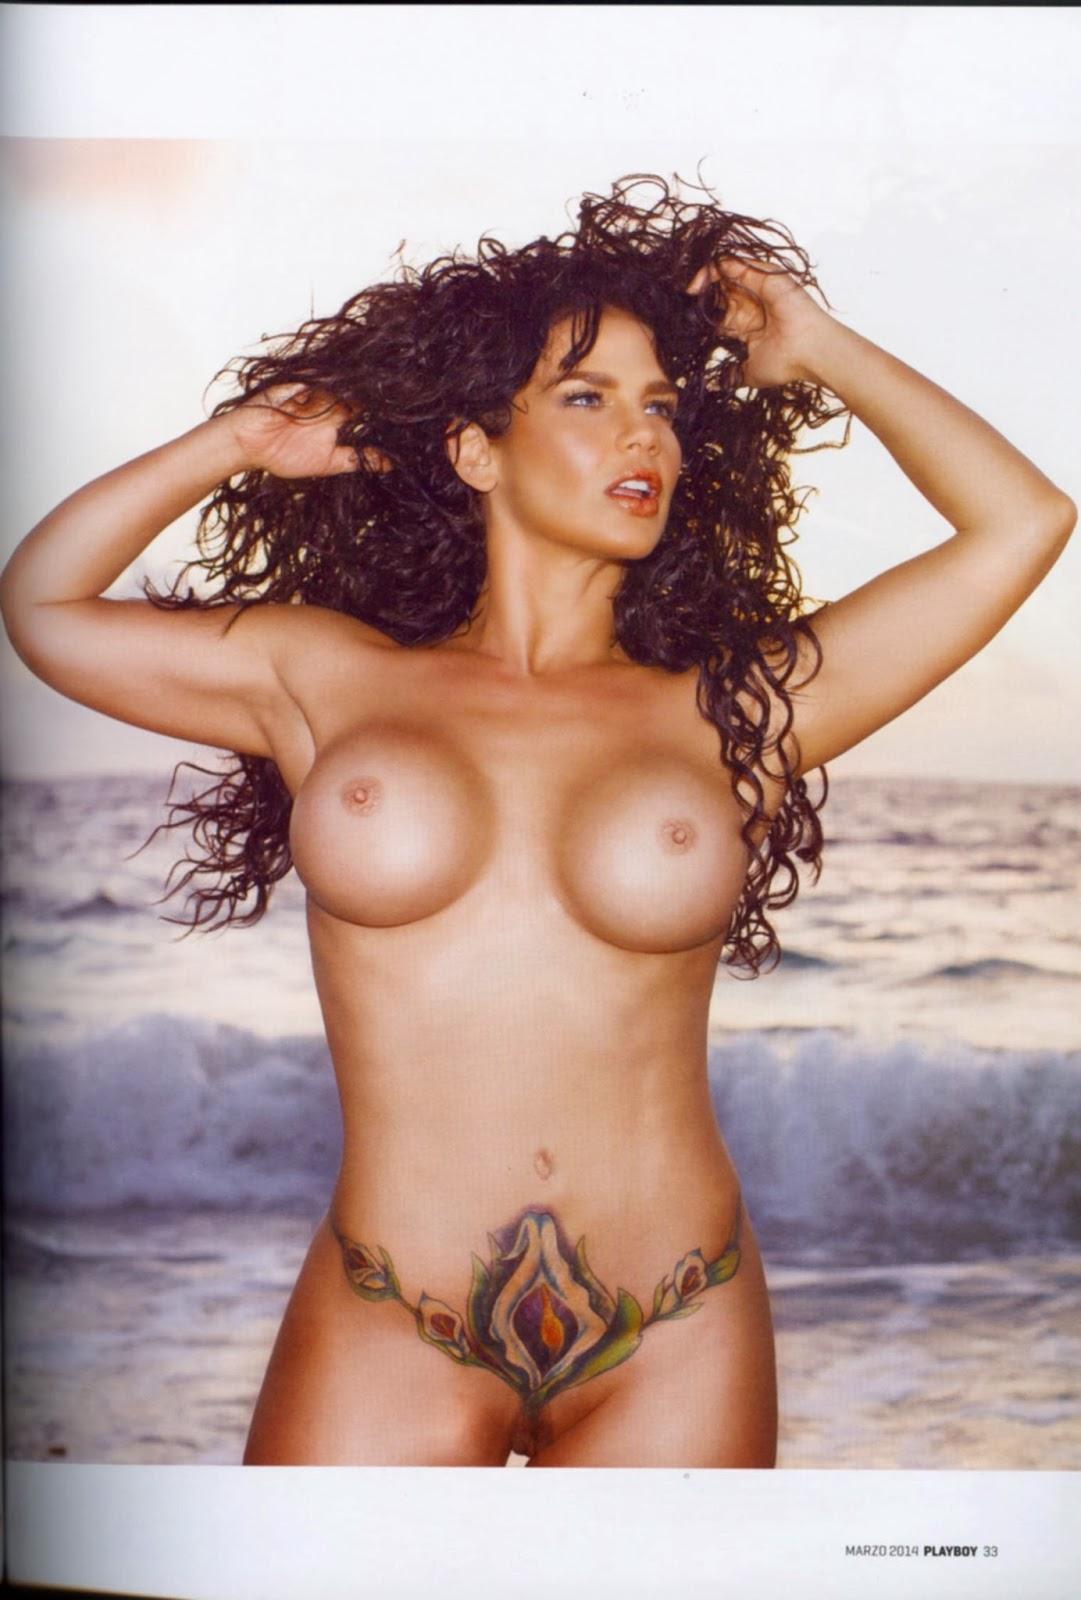 Riding crop girl nude